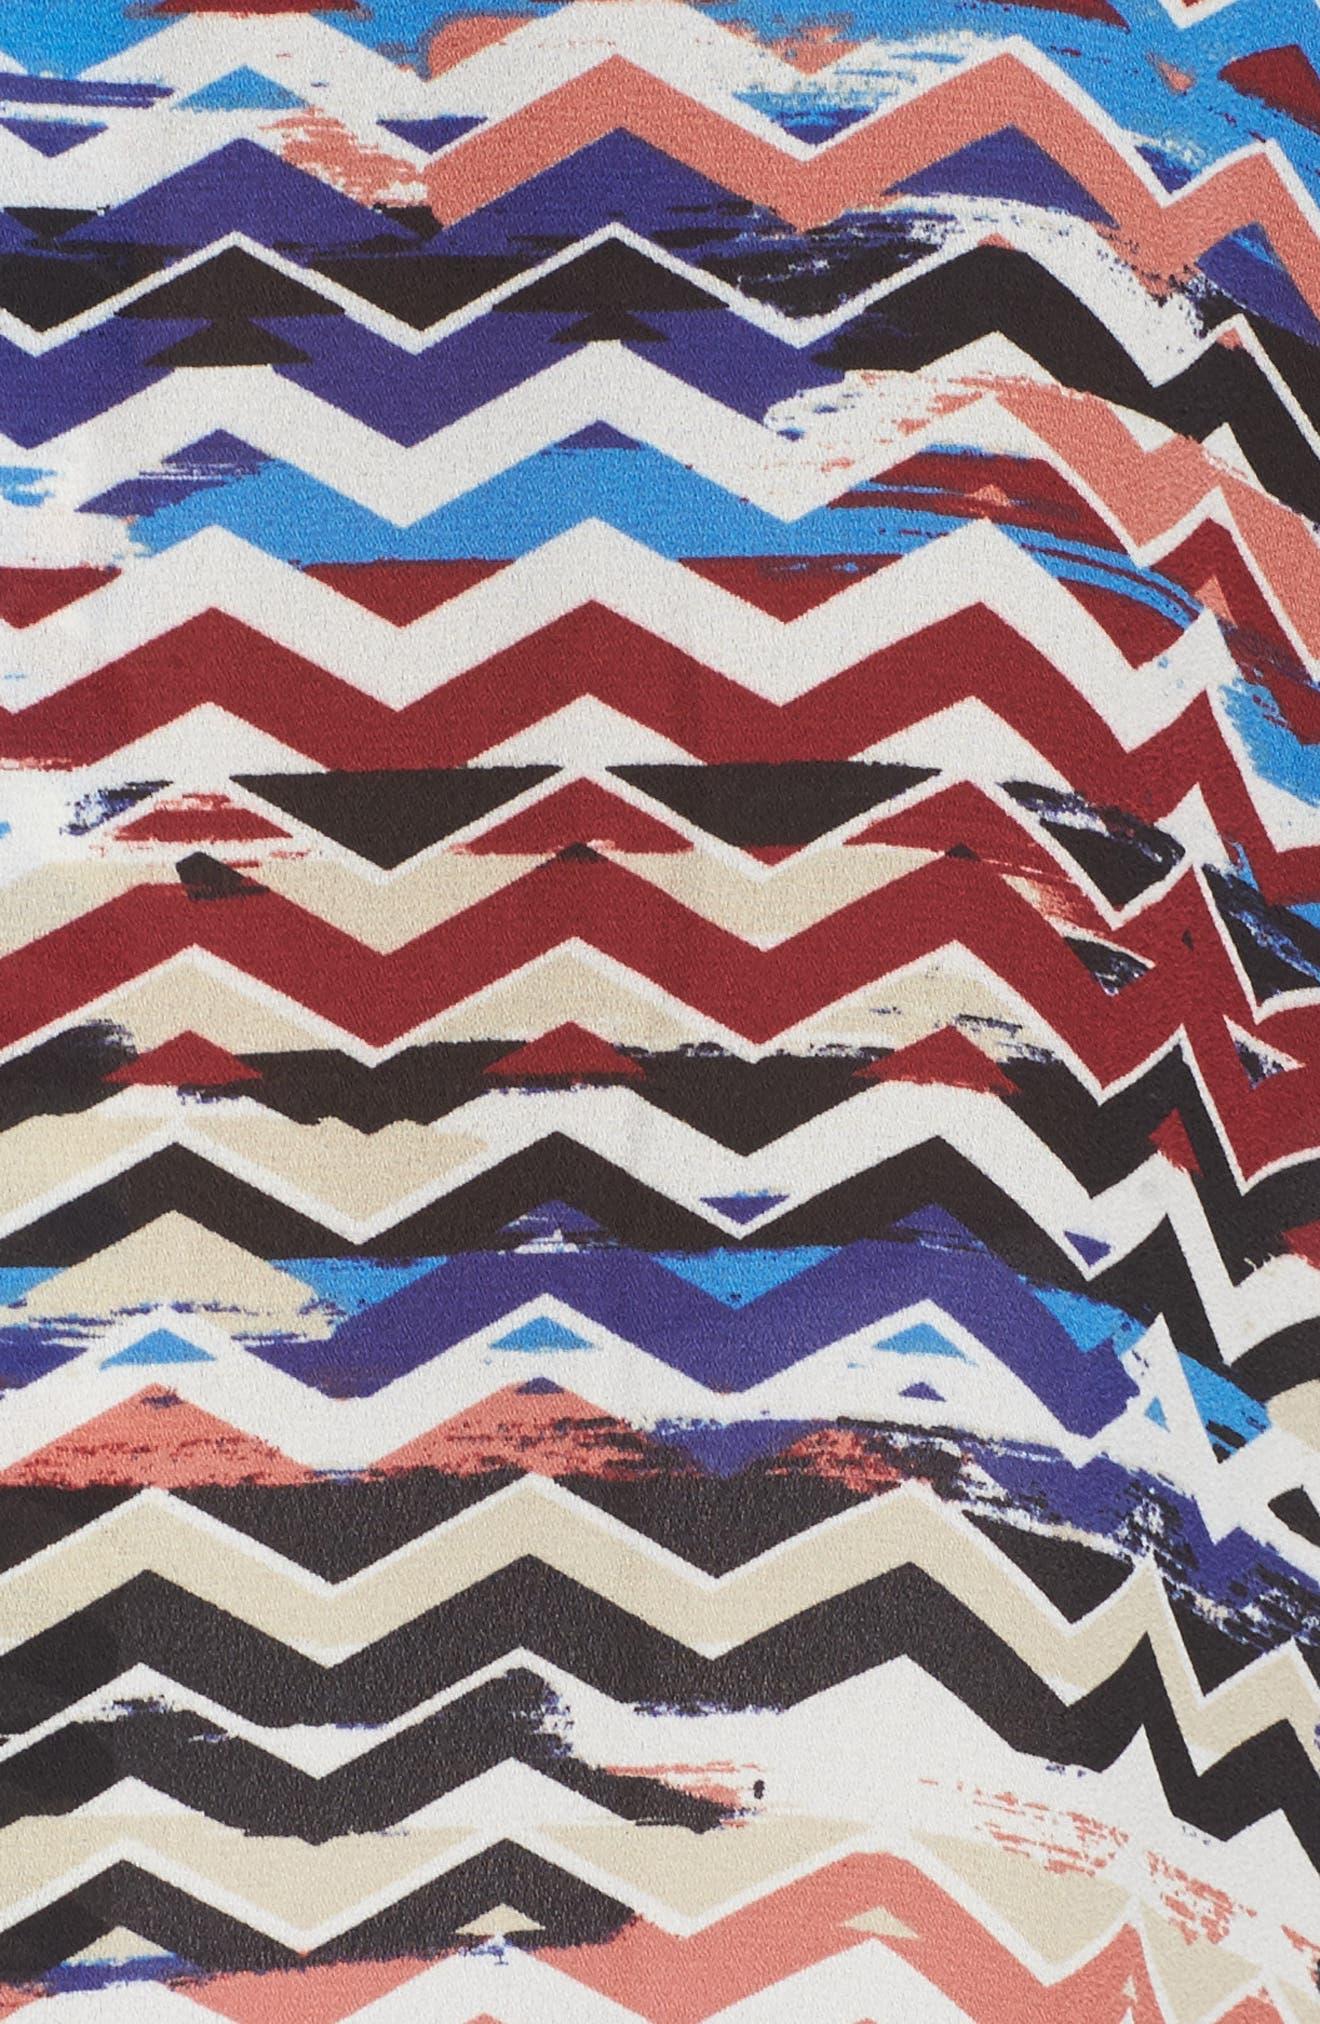 Herringbone Muses Pleat Front Top,                             Alternate thumbnail 5, color,                             Rich Black